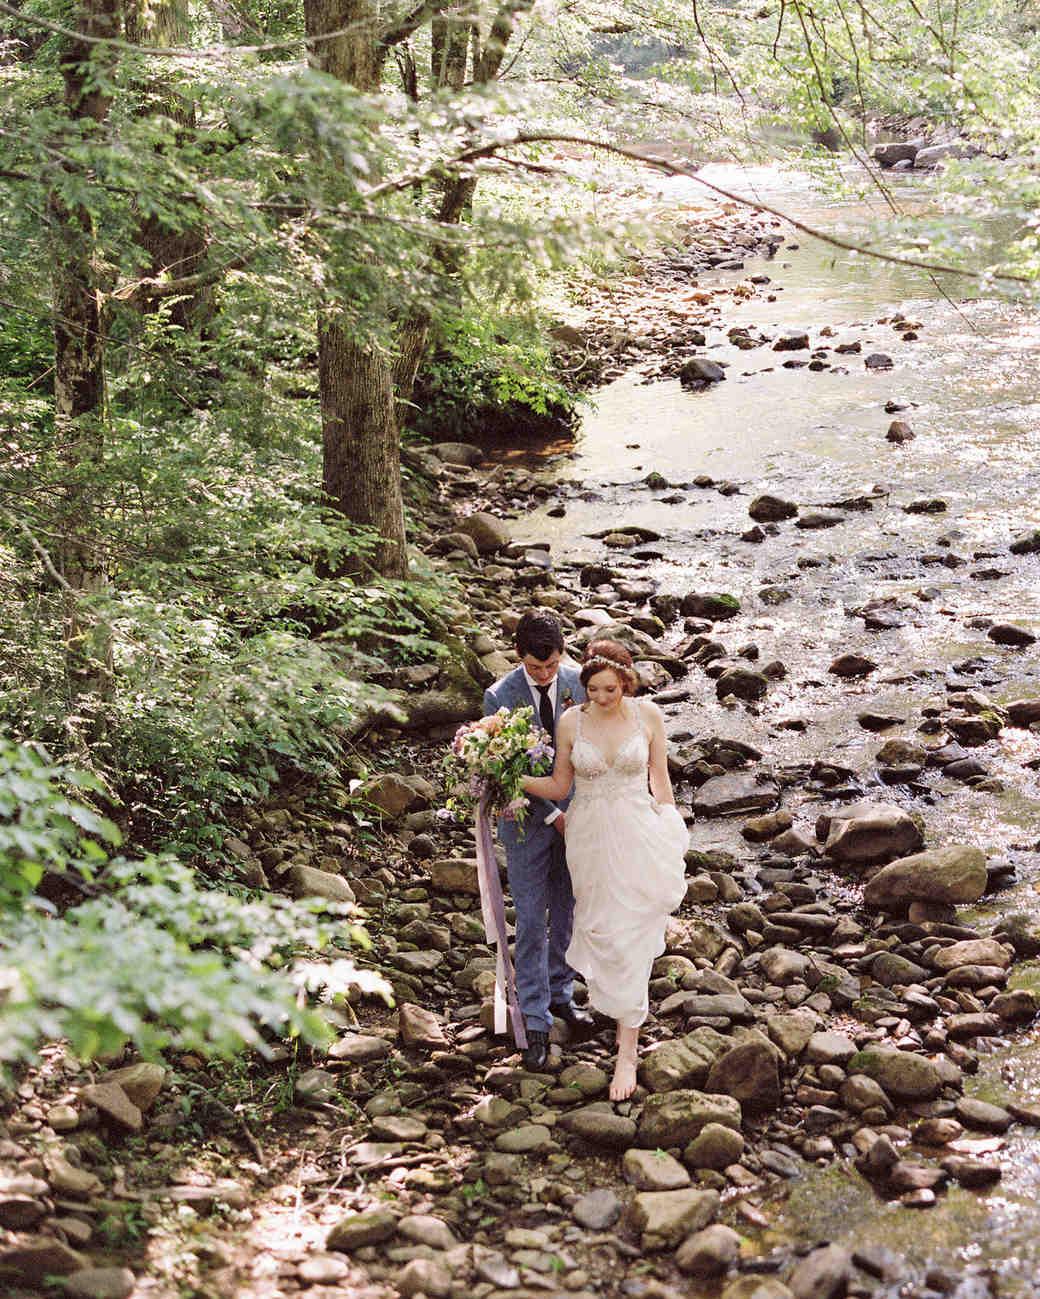 Larkin & Eric's Tennessee wedding - creek